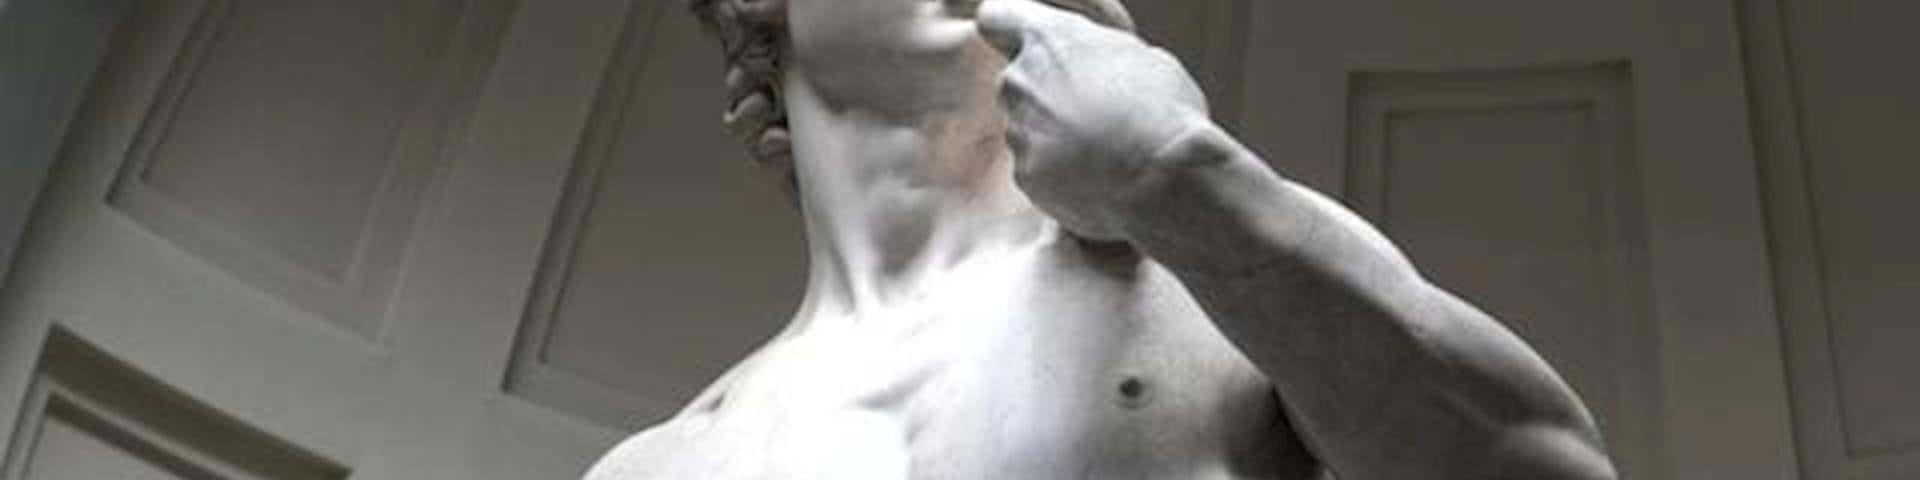 Michelangelo's David Tours